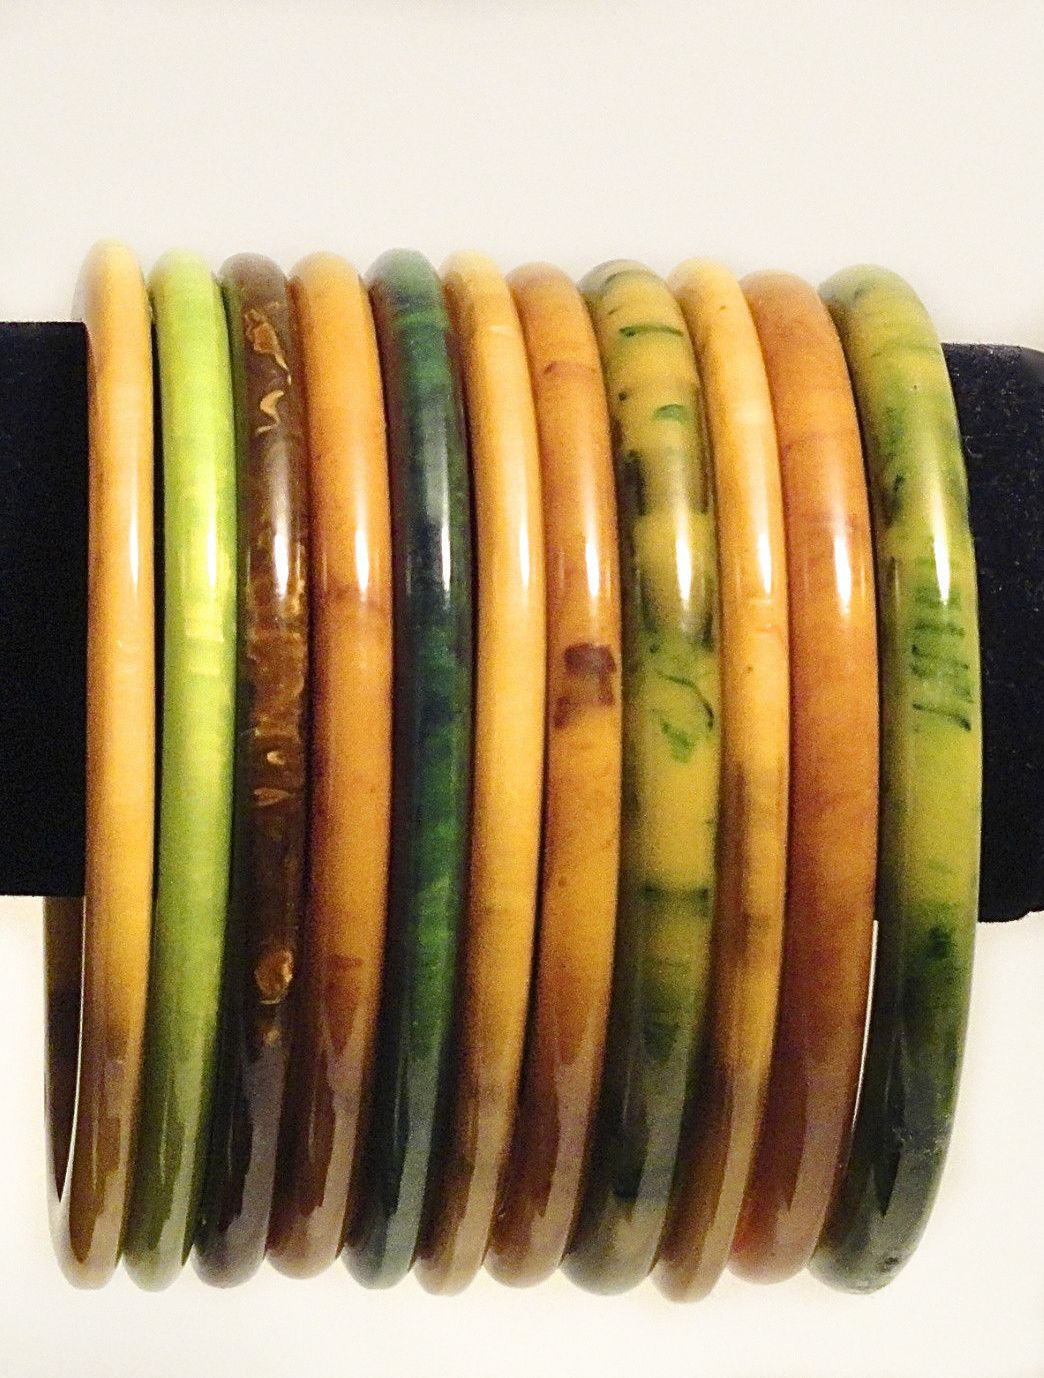 Thin Vintage Bakelite Bracelets